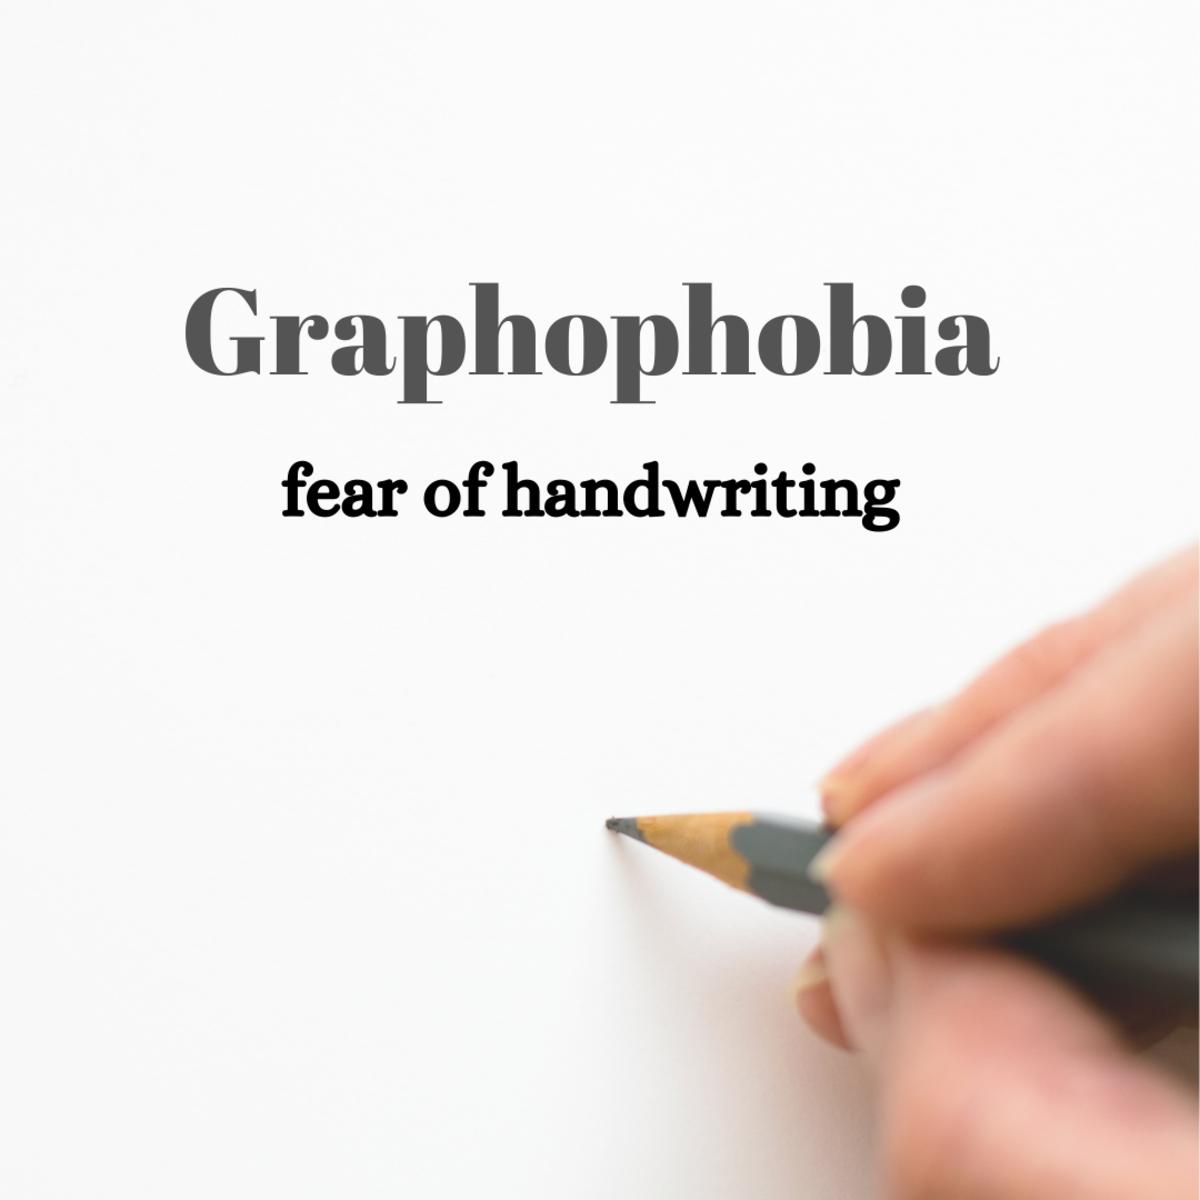 Graphophobia, a fear of handwriting